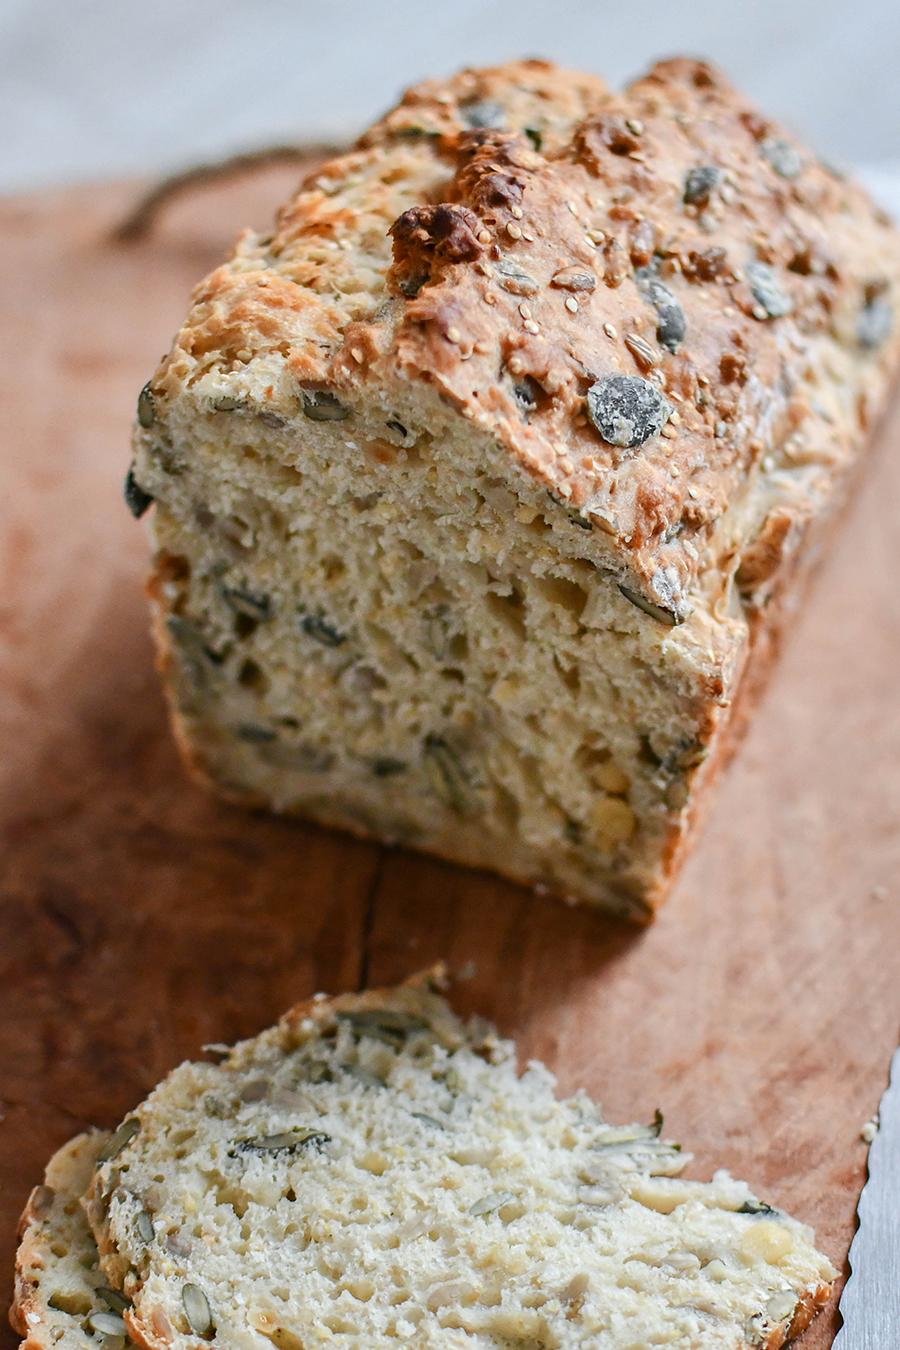 Rezept für jeden Tag: Dinkel-Körner-Brot